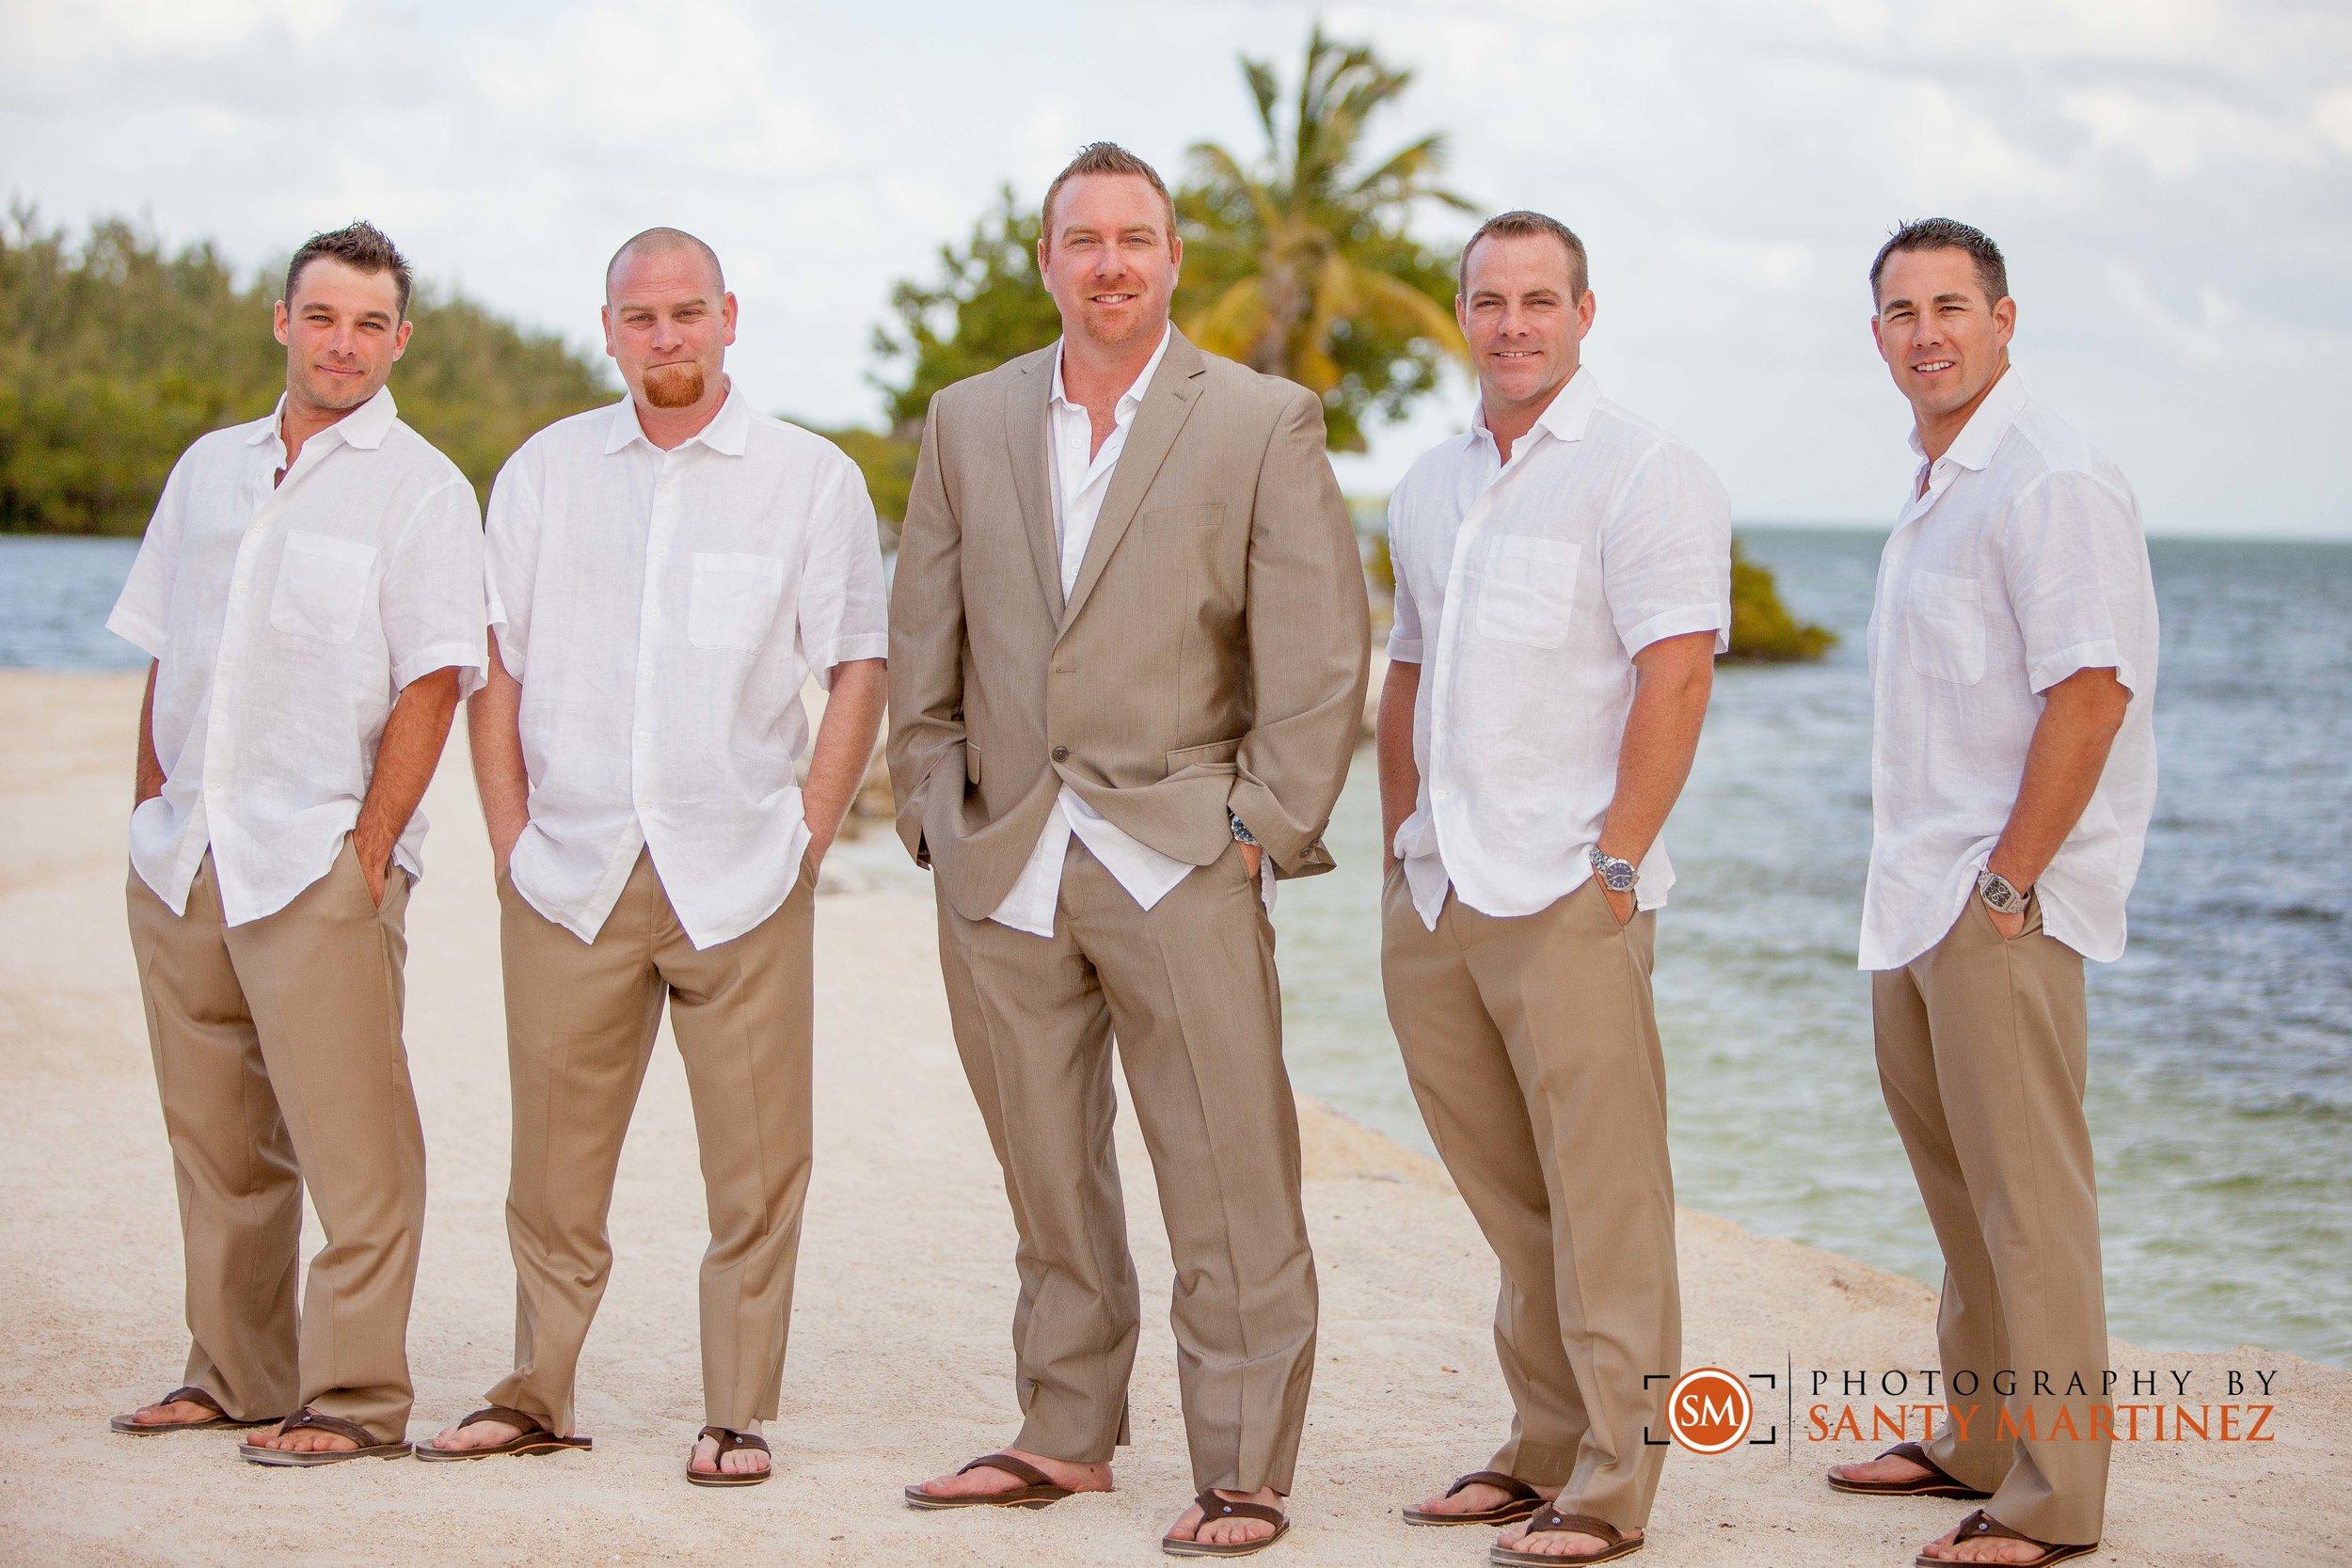 Photography by Santy Martinez - Miami Wedding Photographer-013.jpg